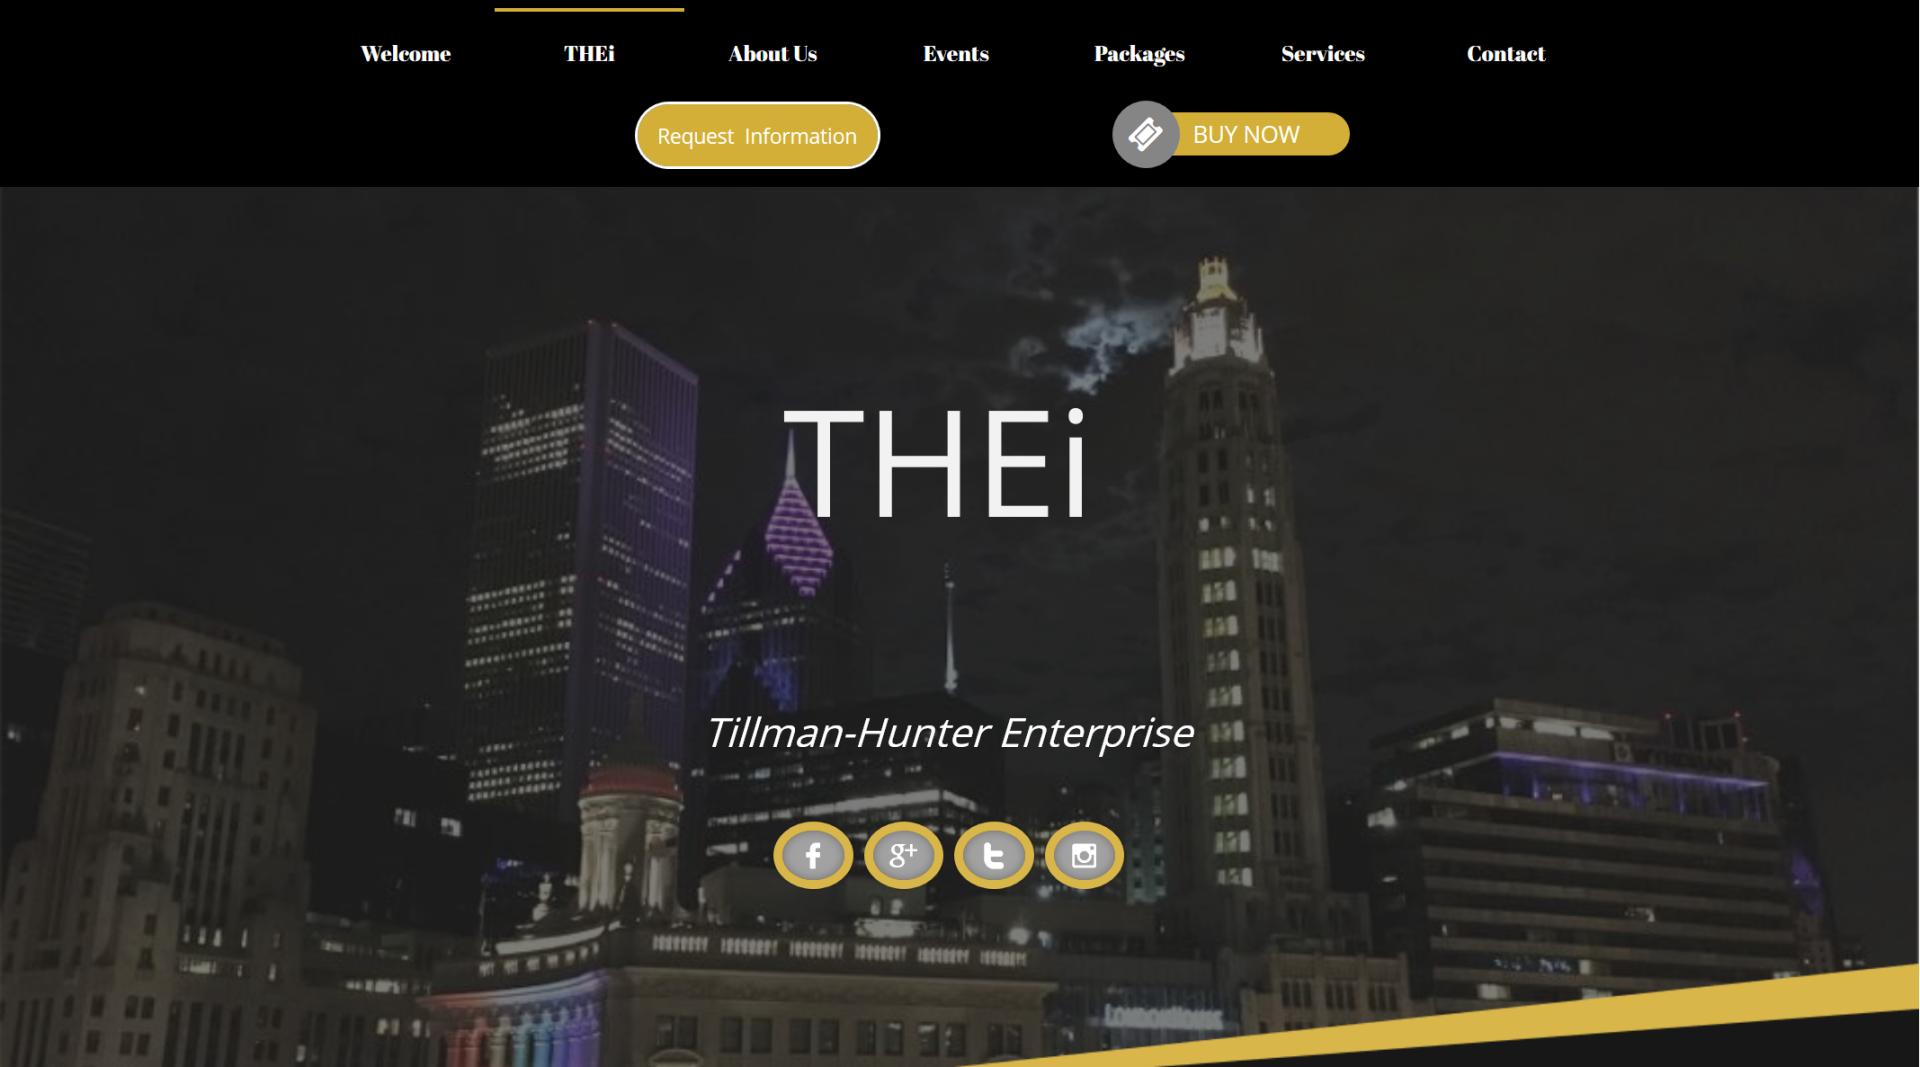 Tillman-Hunter Enterprise